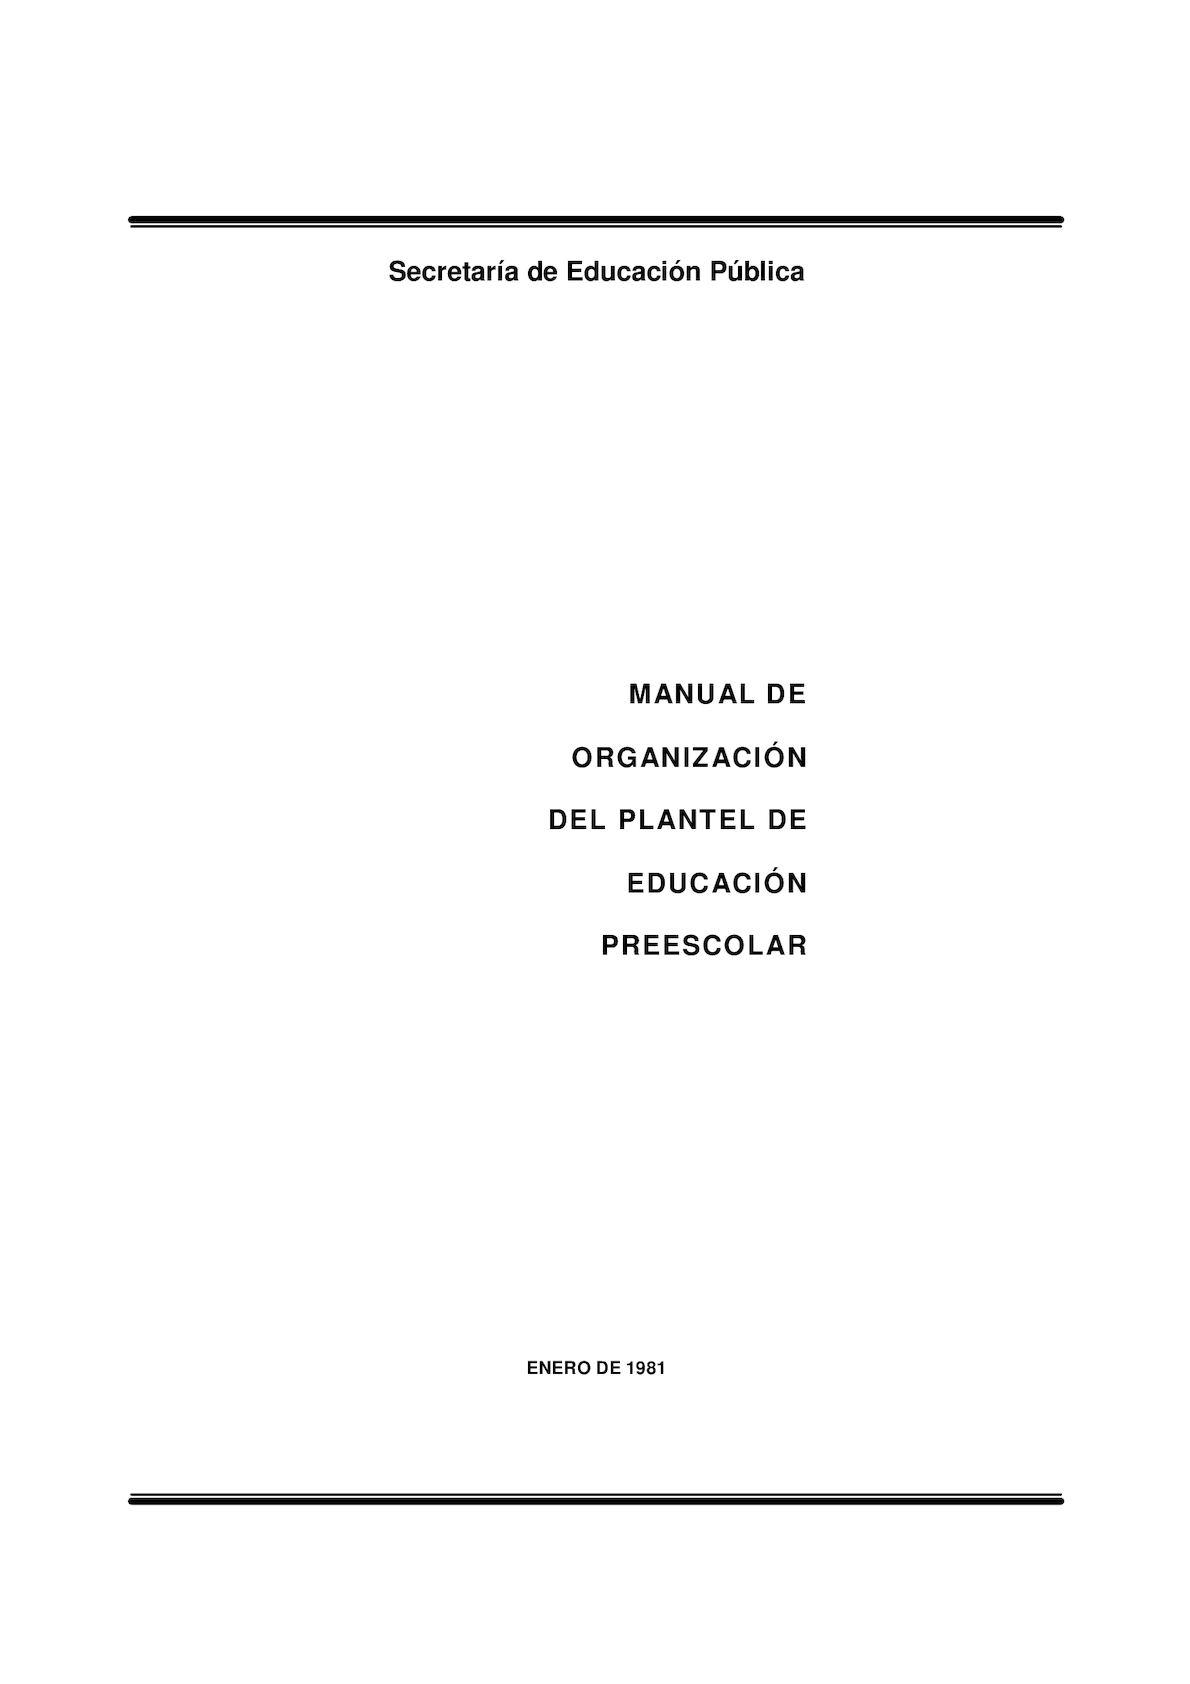 Manual Org Plantel Preescolar